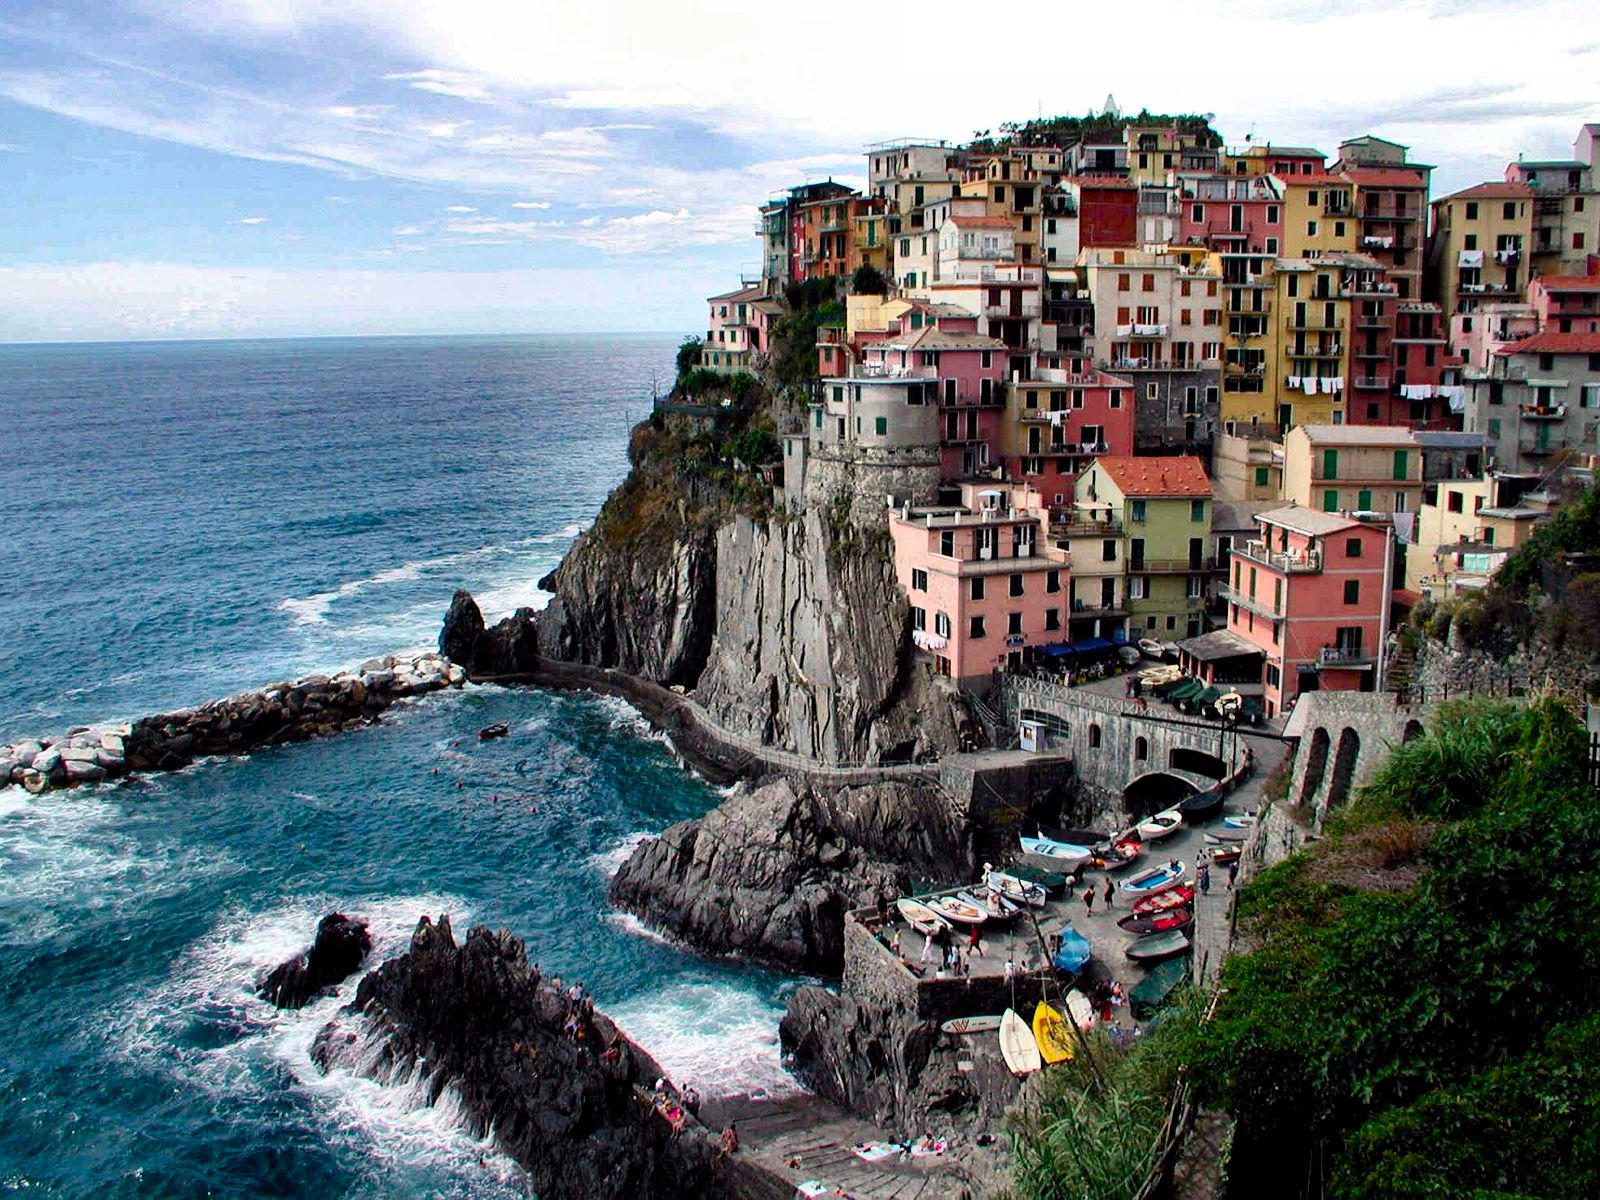 Manarola Italy by puddlz